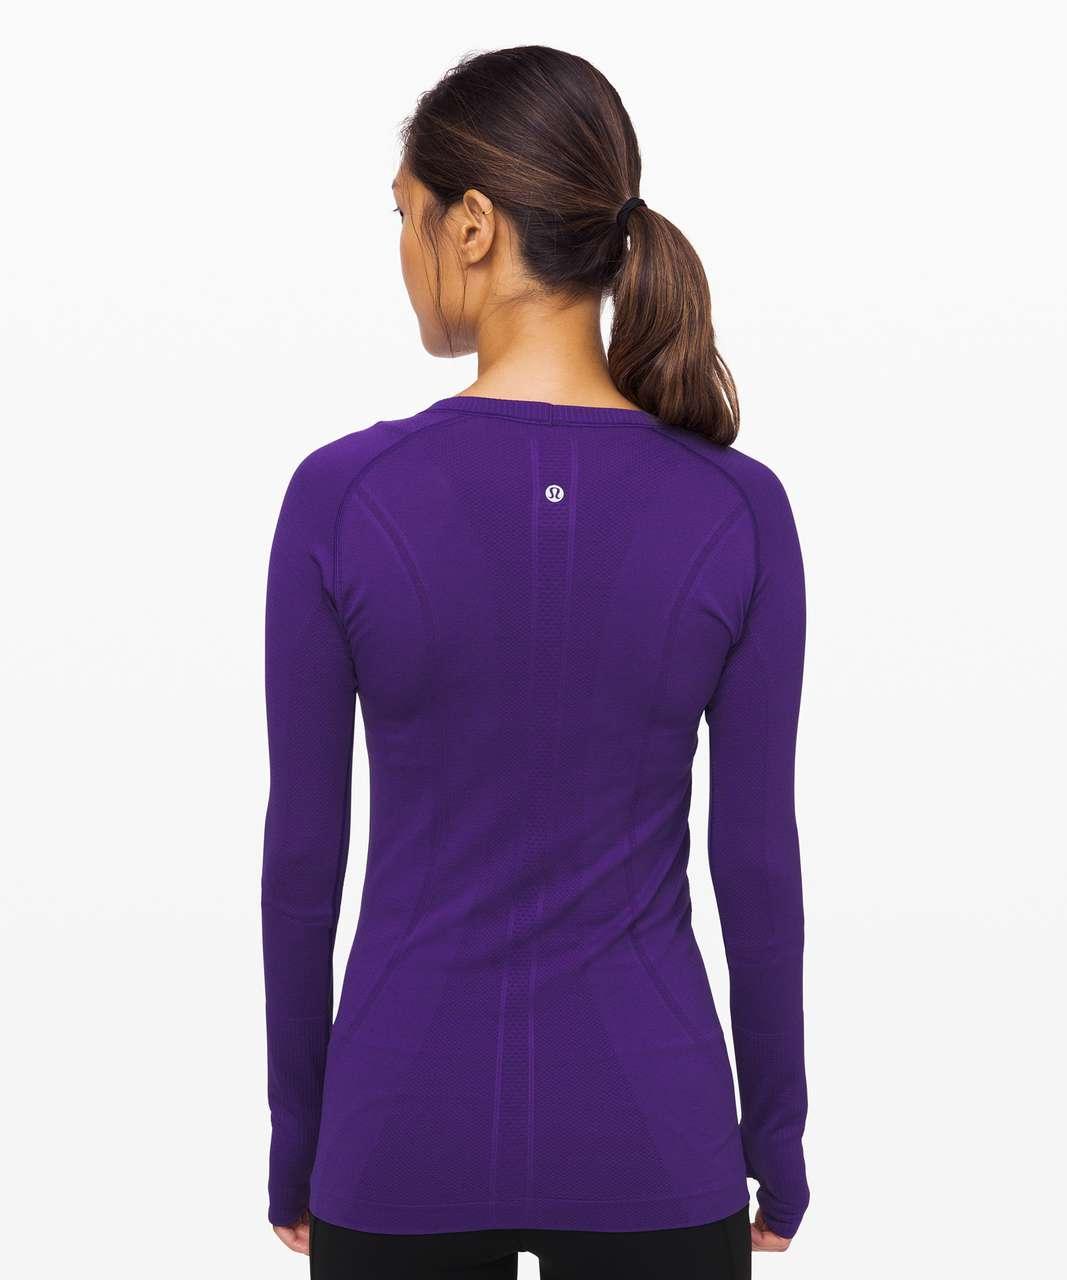 Lululemon Swiftly Tech Long Sleeve Crew - Court Purple / Court Purple